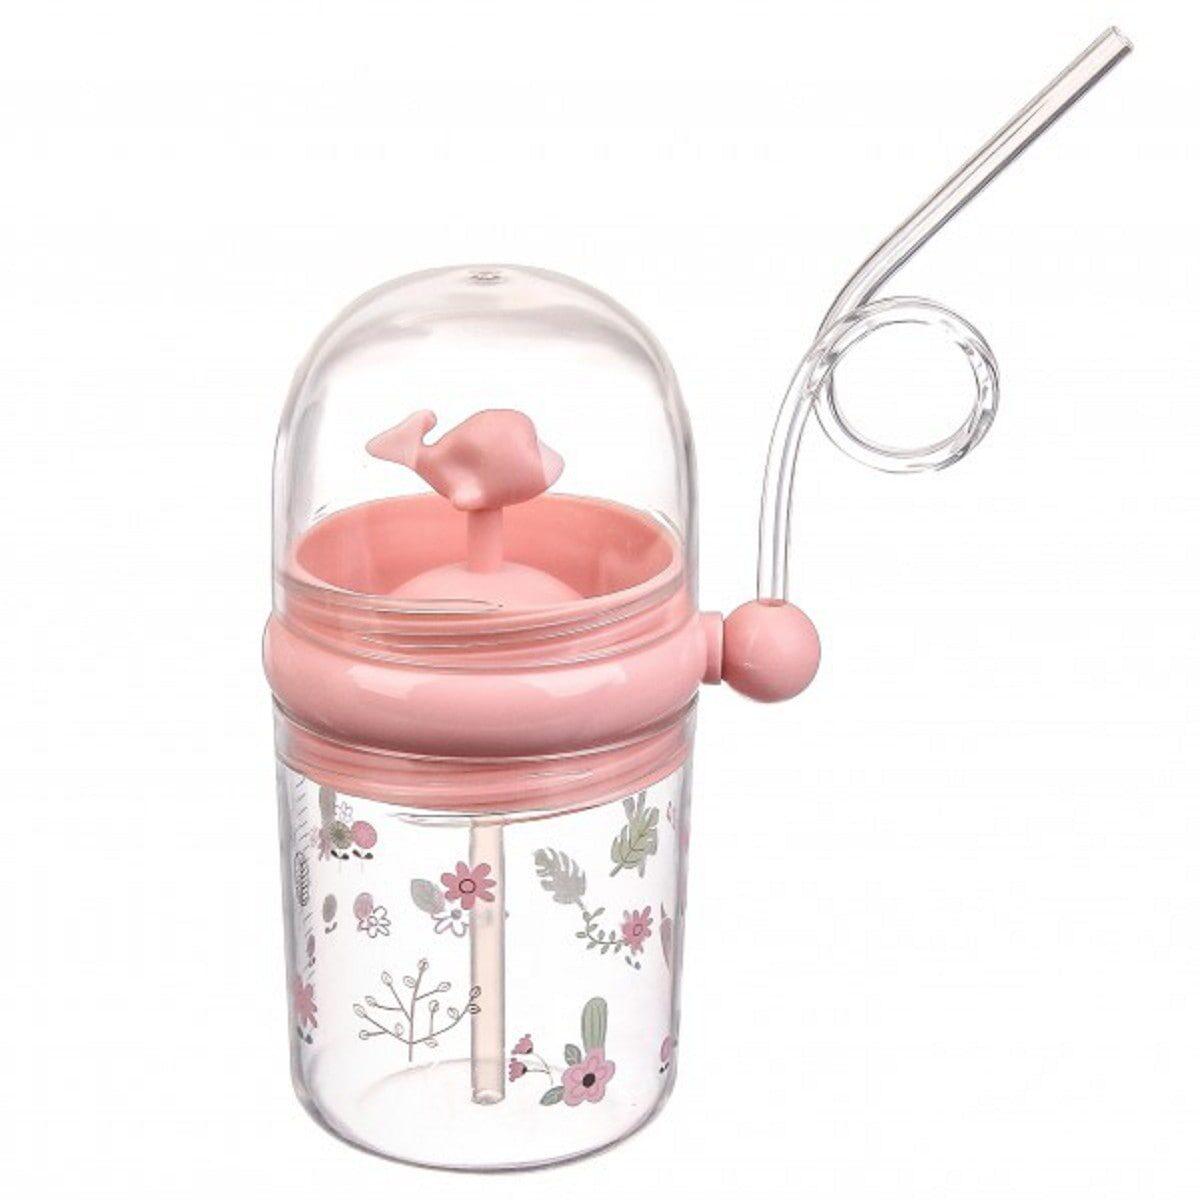 Пляшка дитяча пластикова з фонтанчиком 260мл, рожева